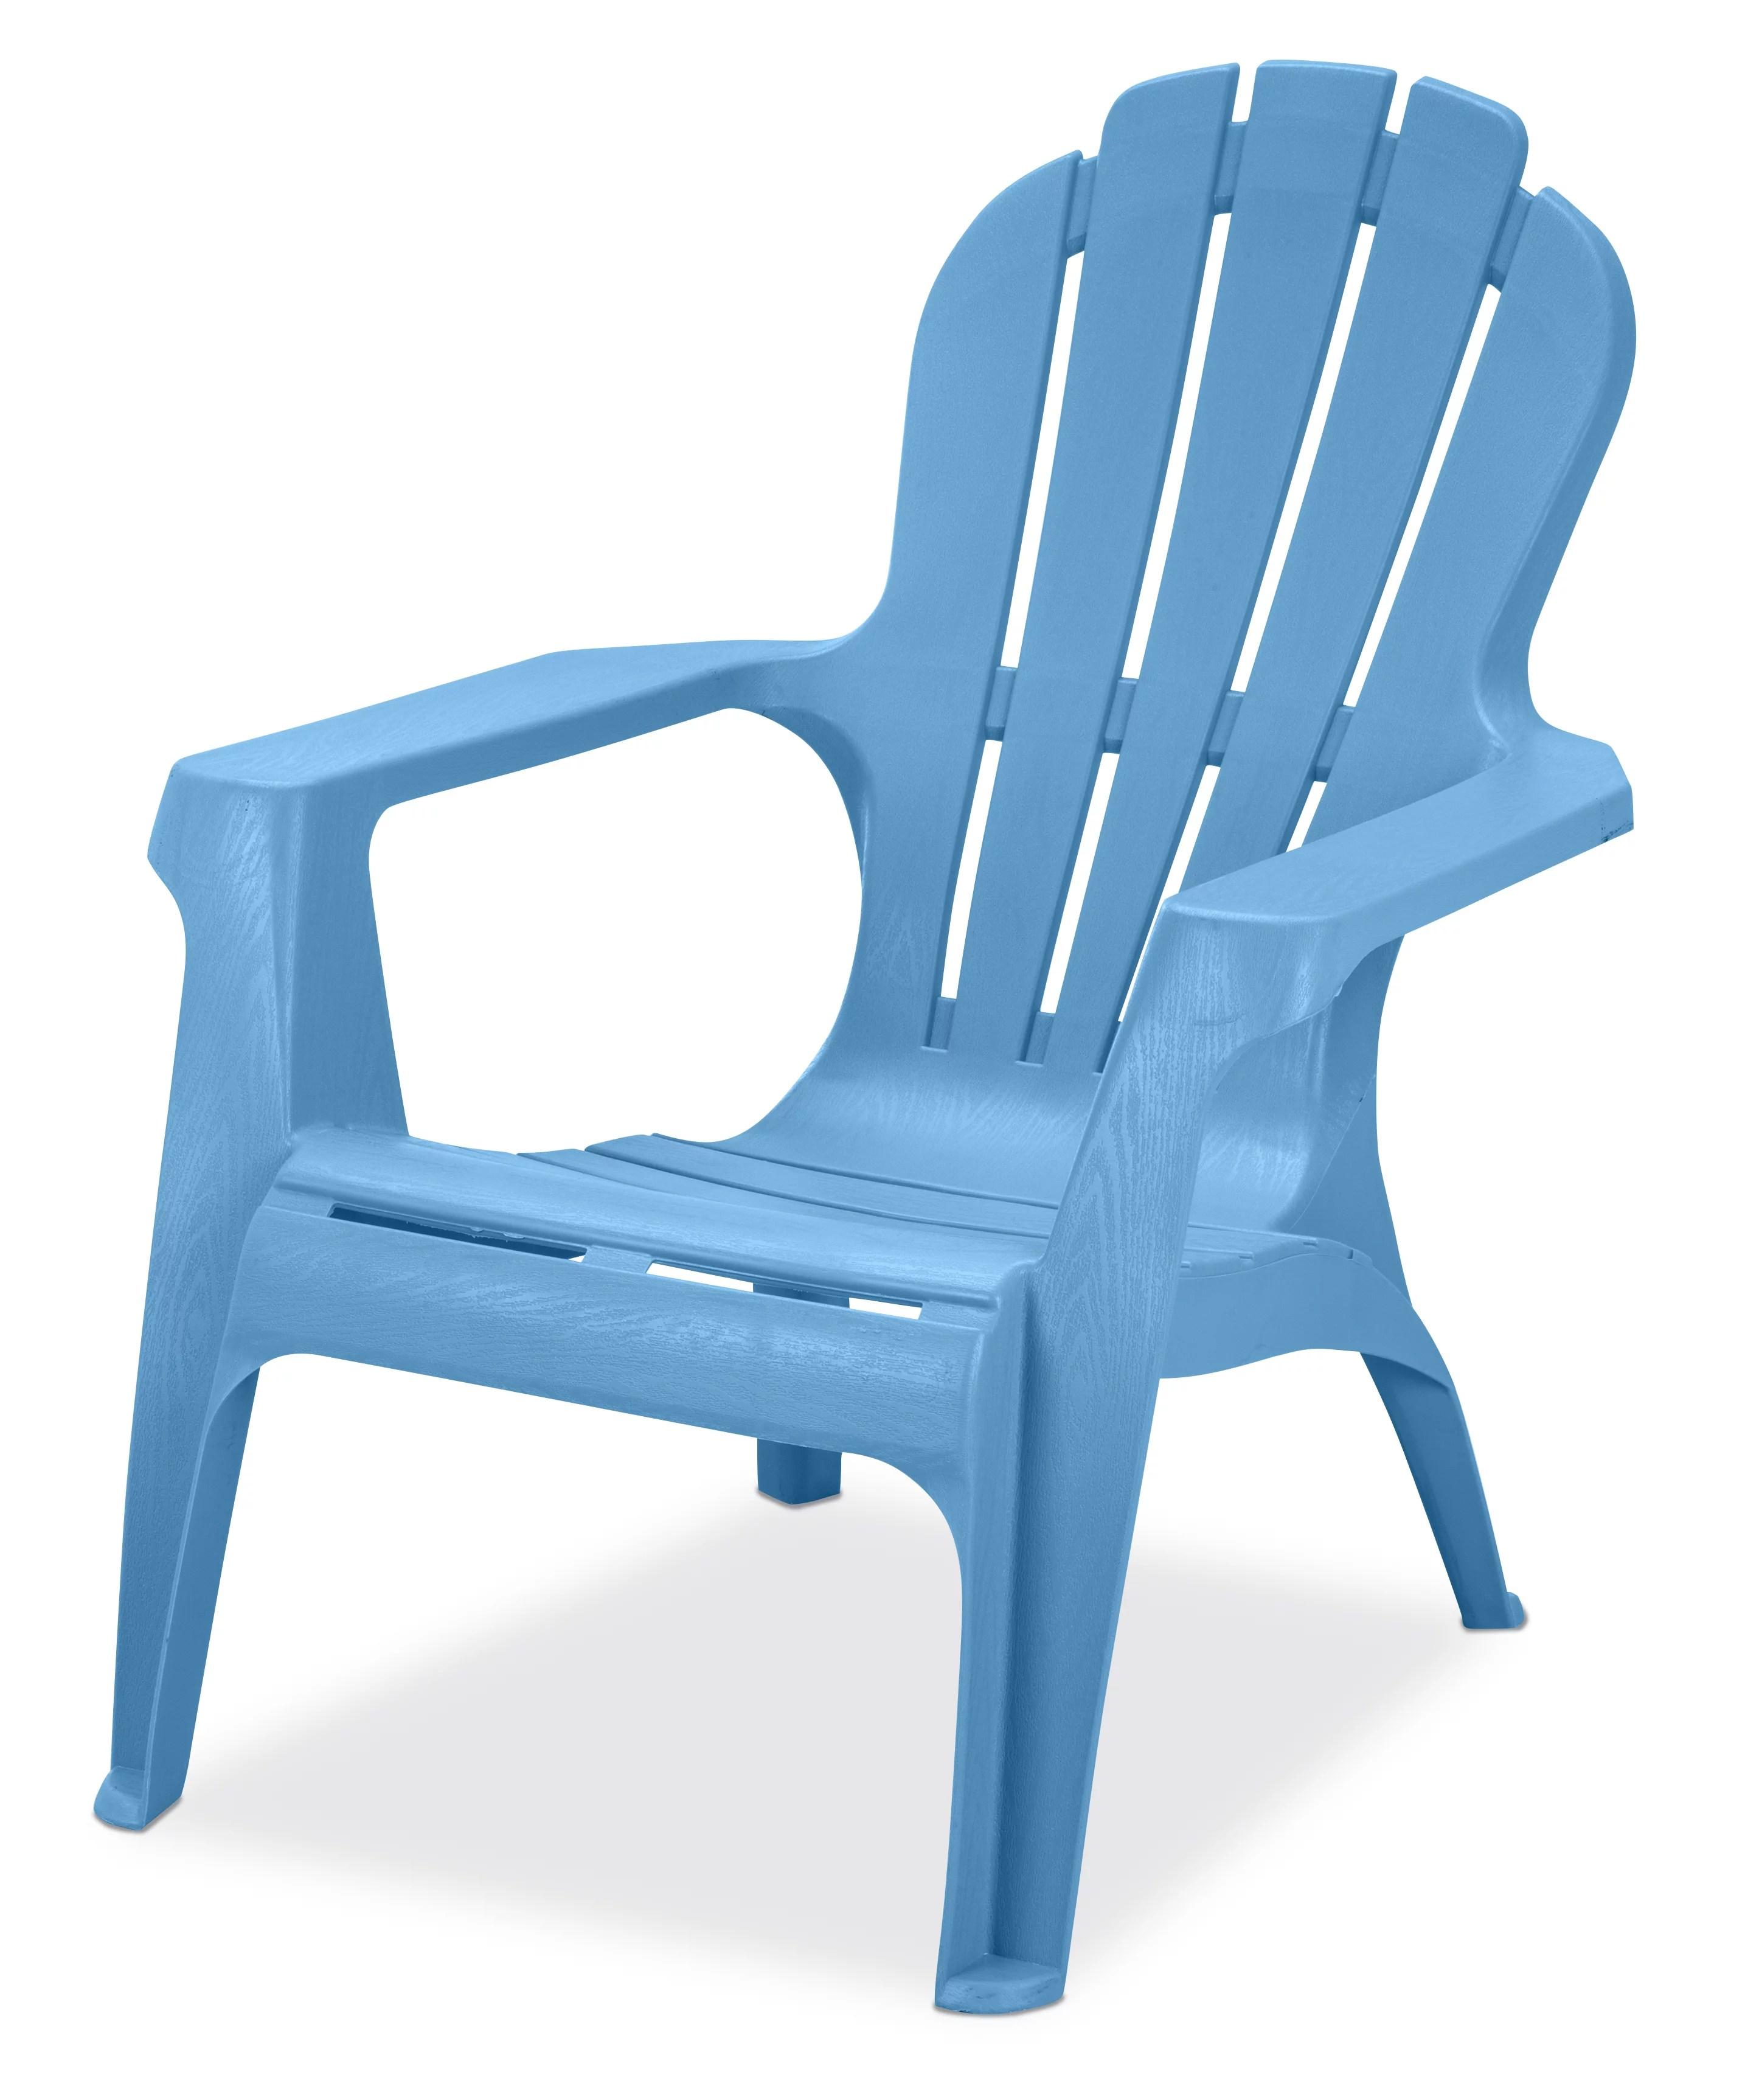 us leisure resin adirondack plastic patio furniture chair blue walmart com walmart com